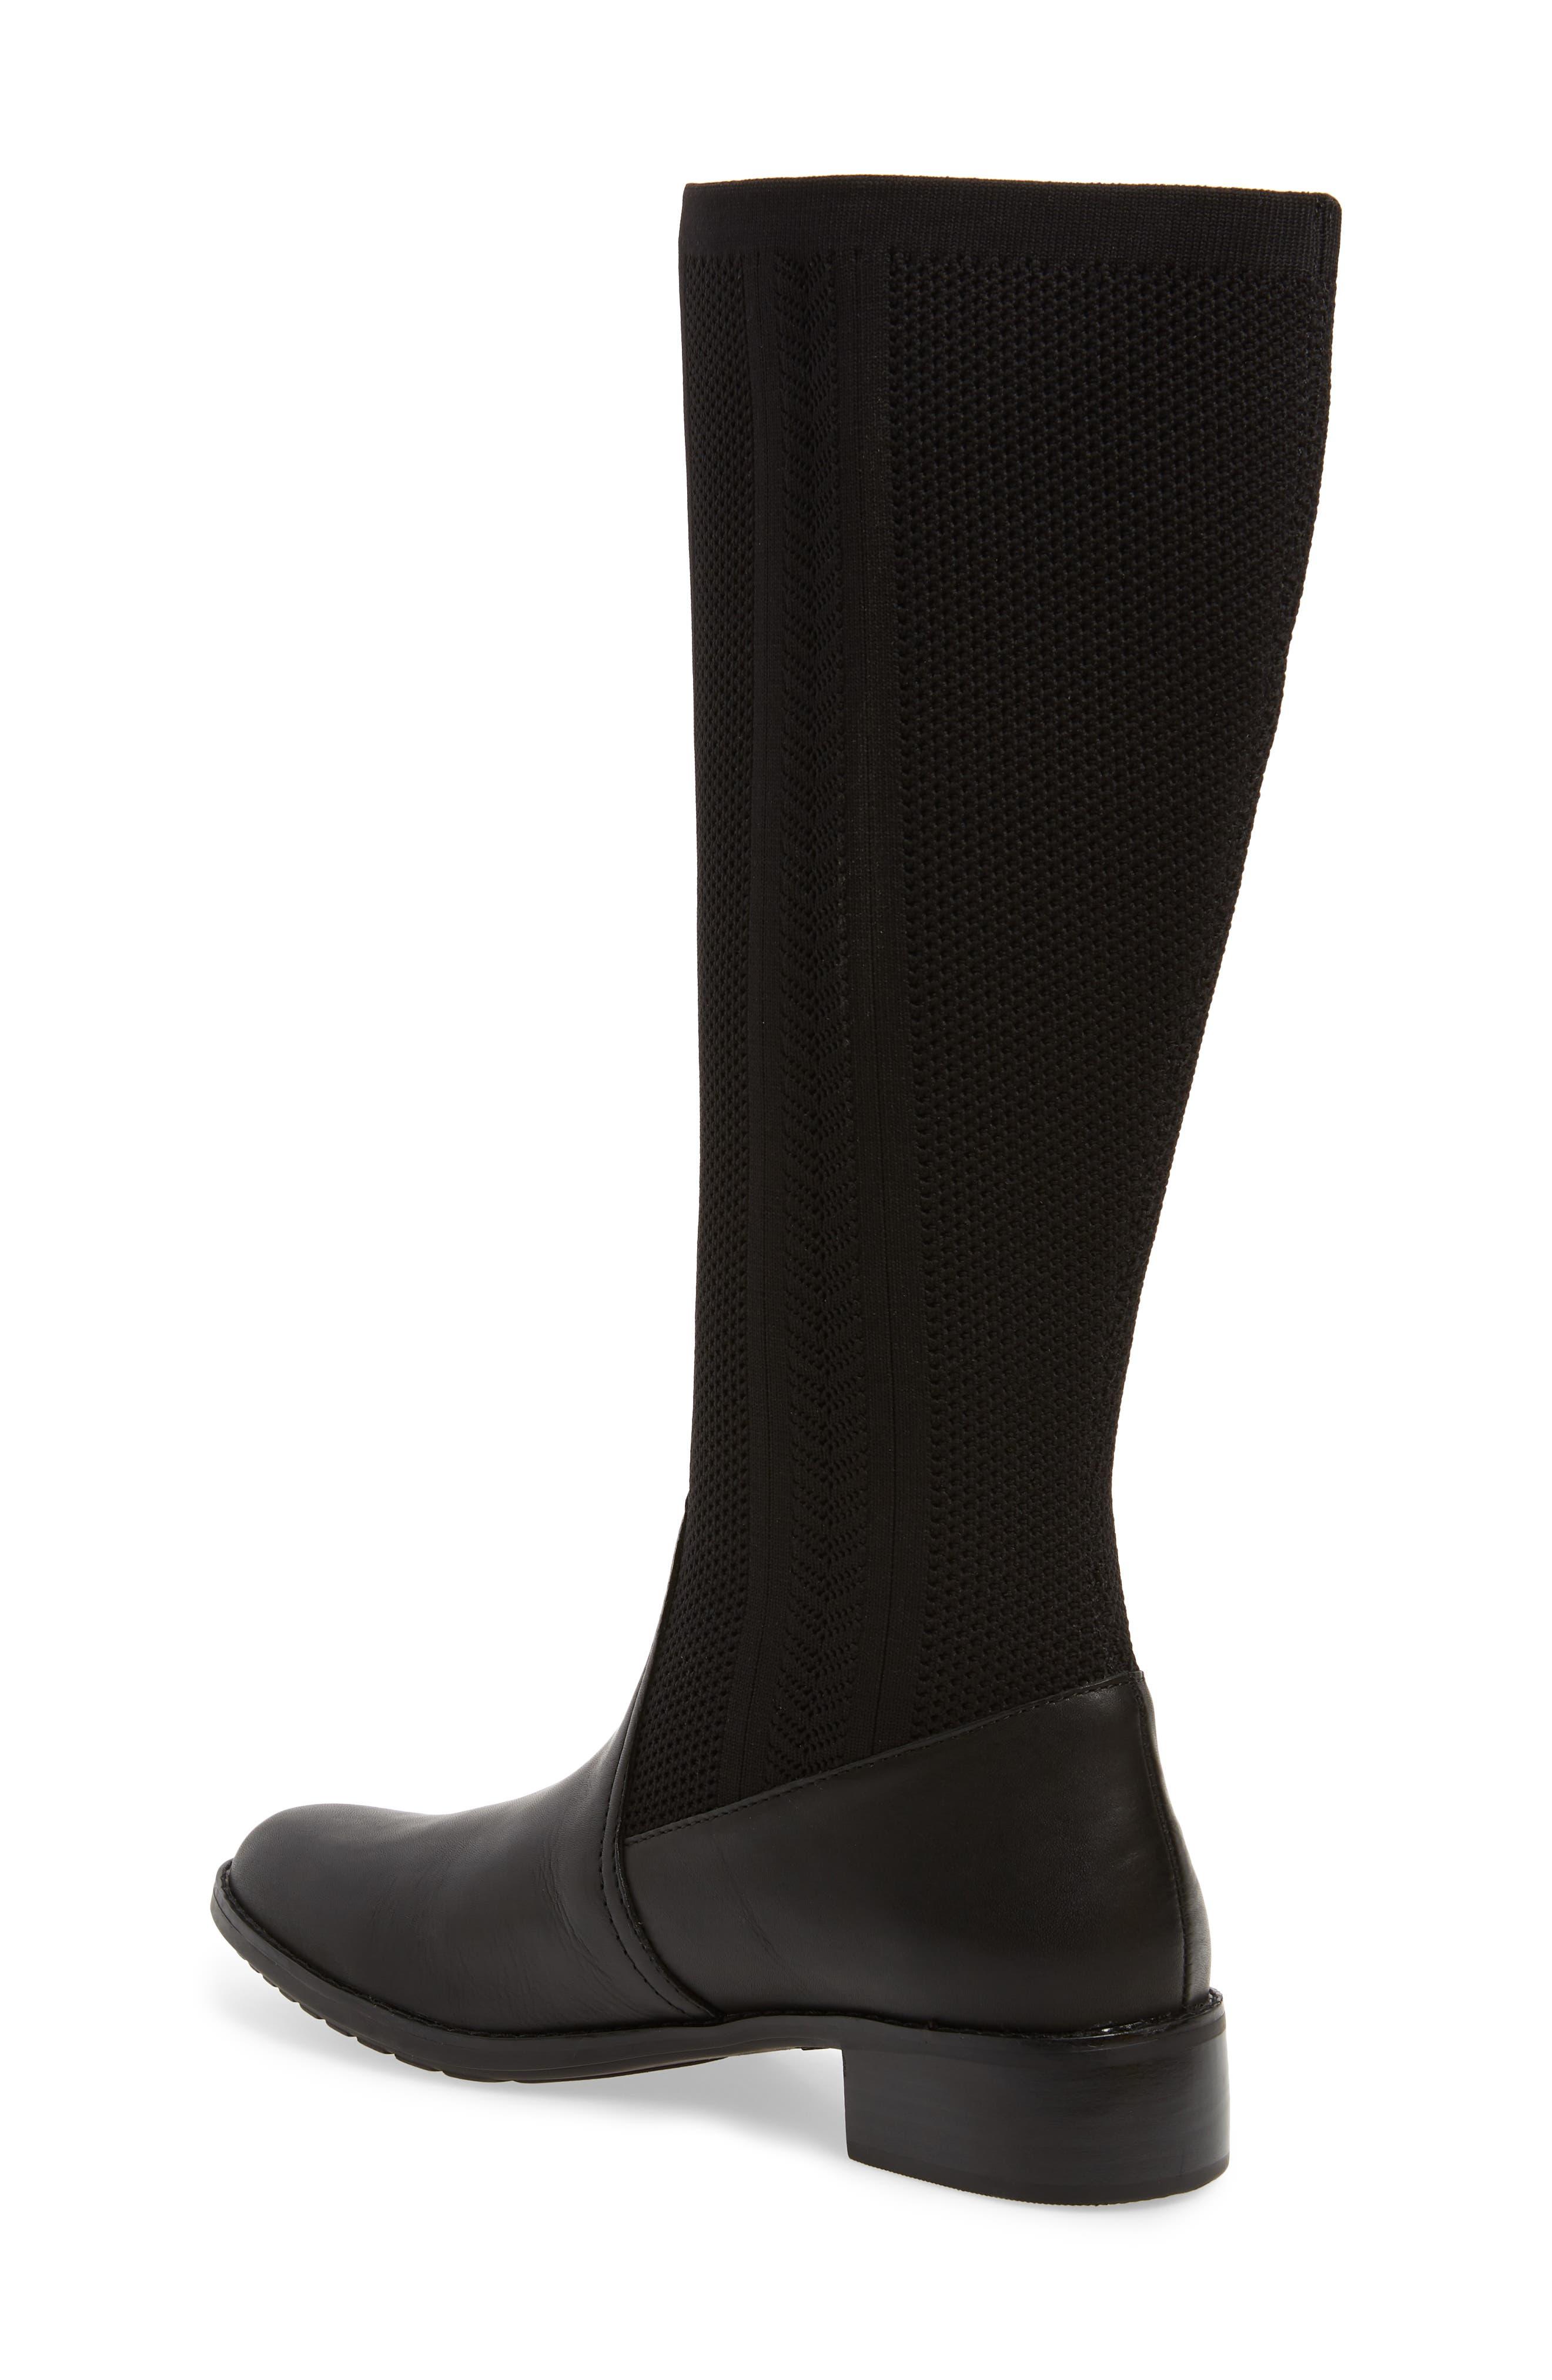 5f720220823c Women s Aetrex Boots